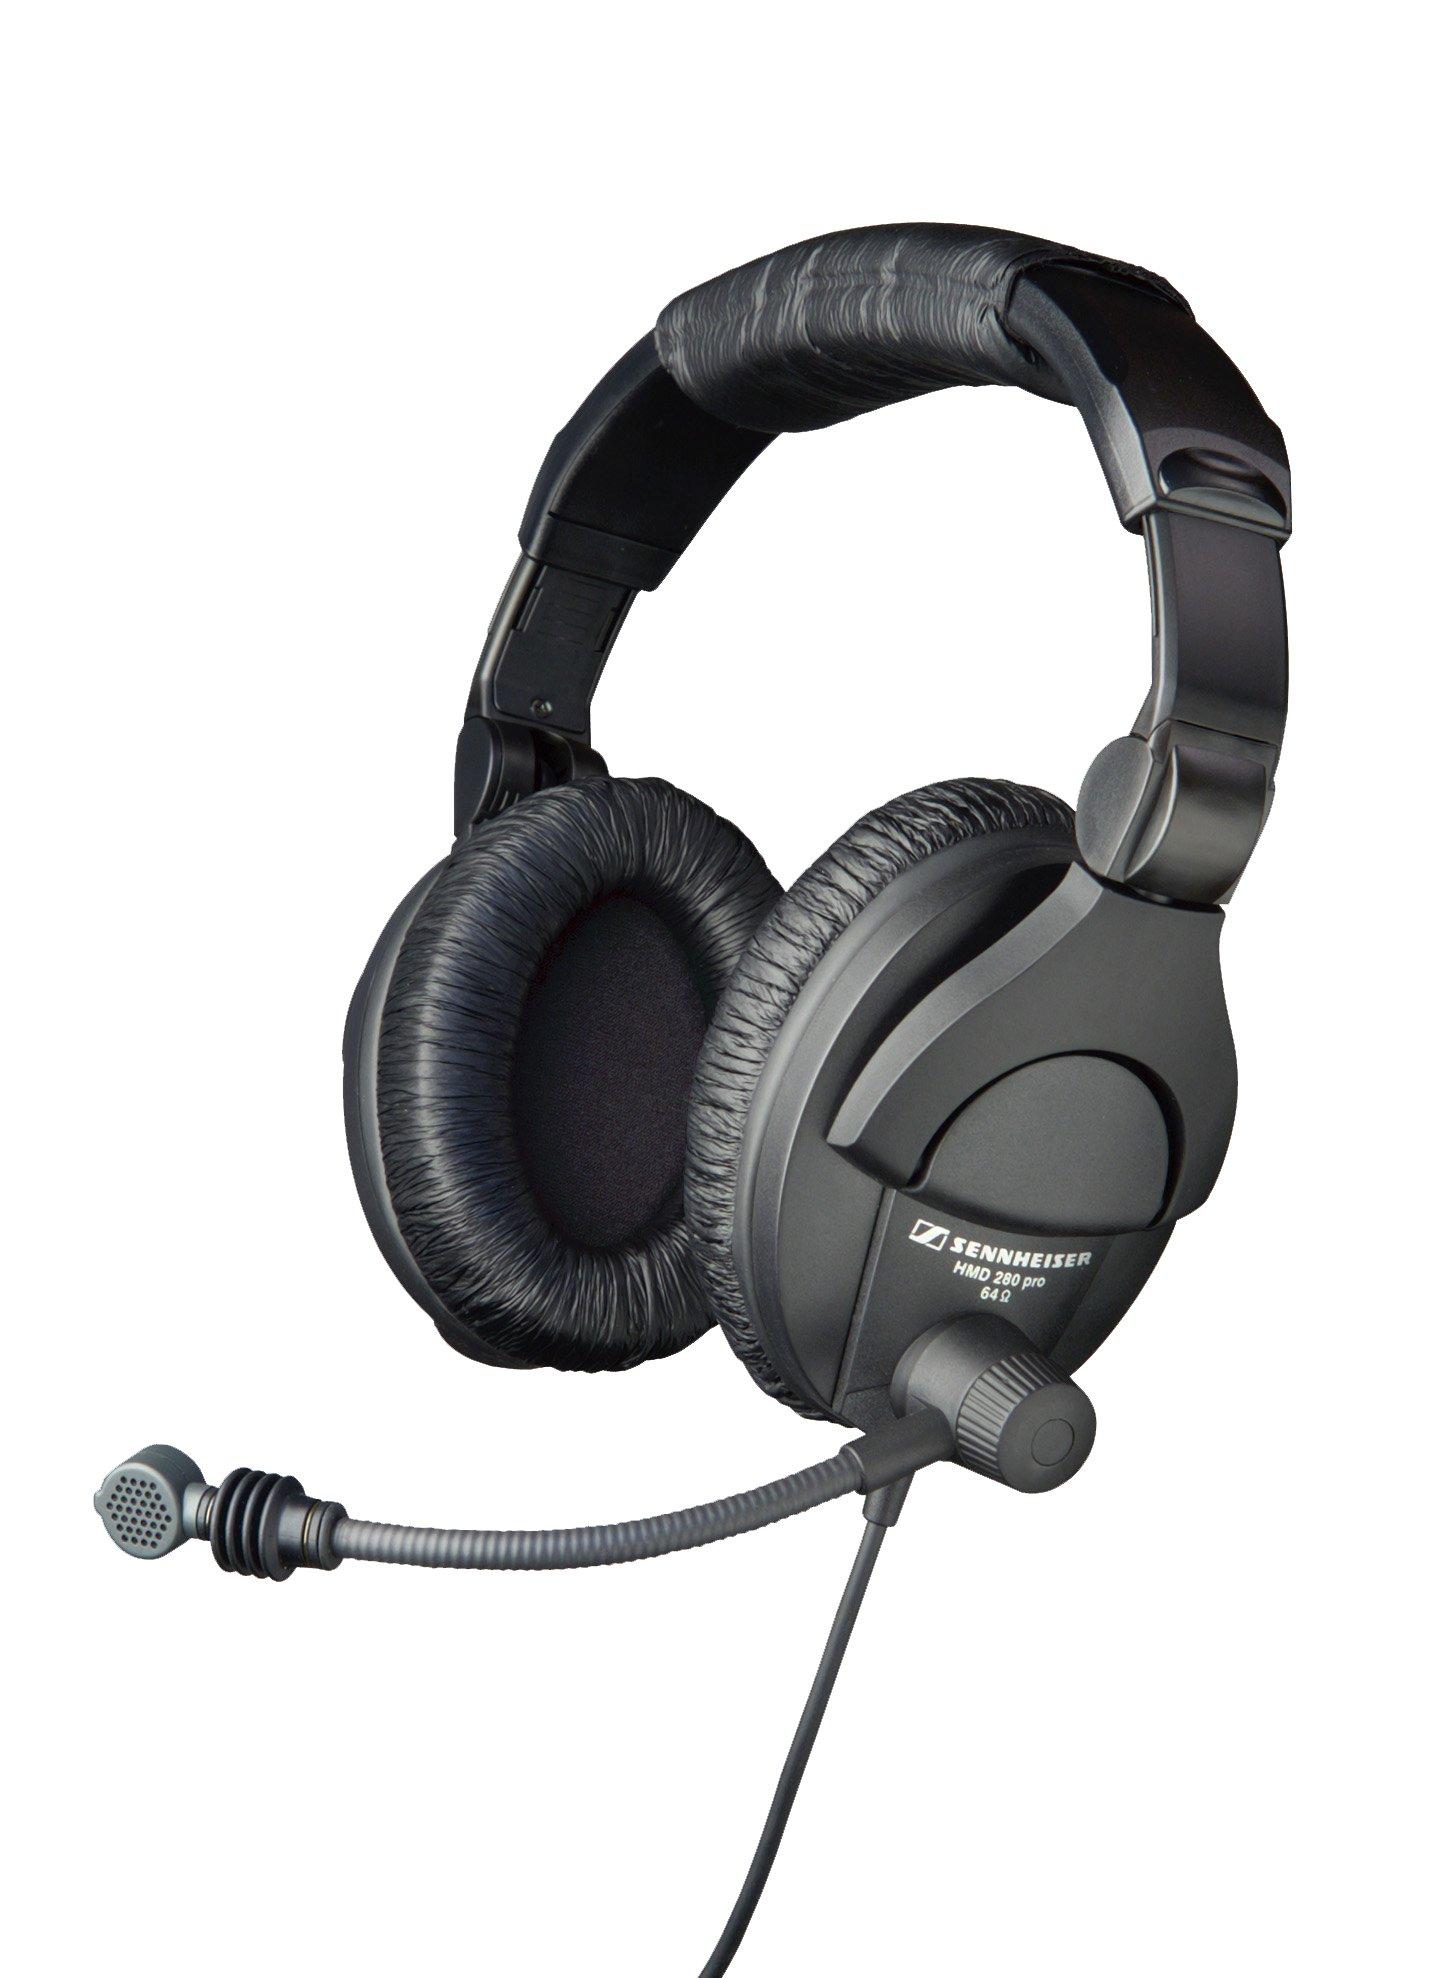 Sennheiser HDM 280-13 - Professional Communication Headset for High Noise Environments by Sennheiser